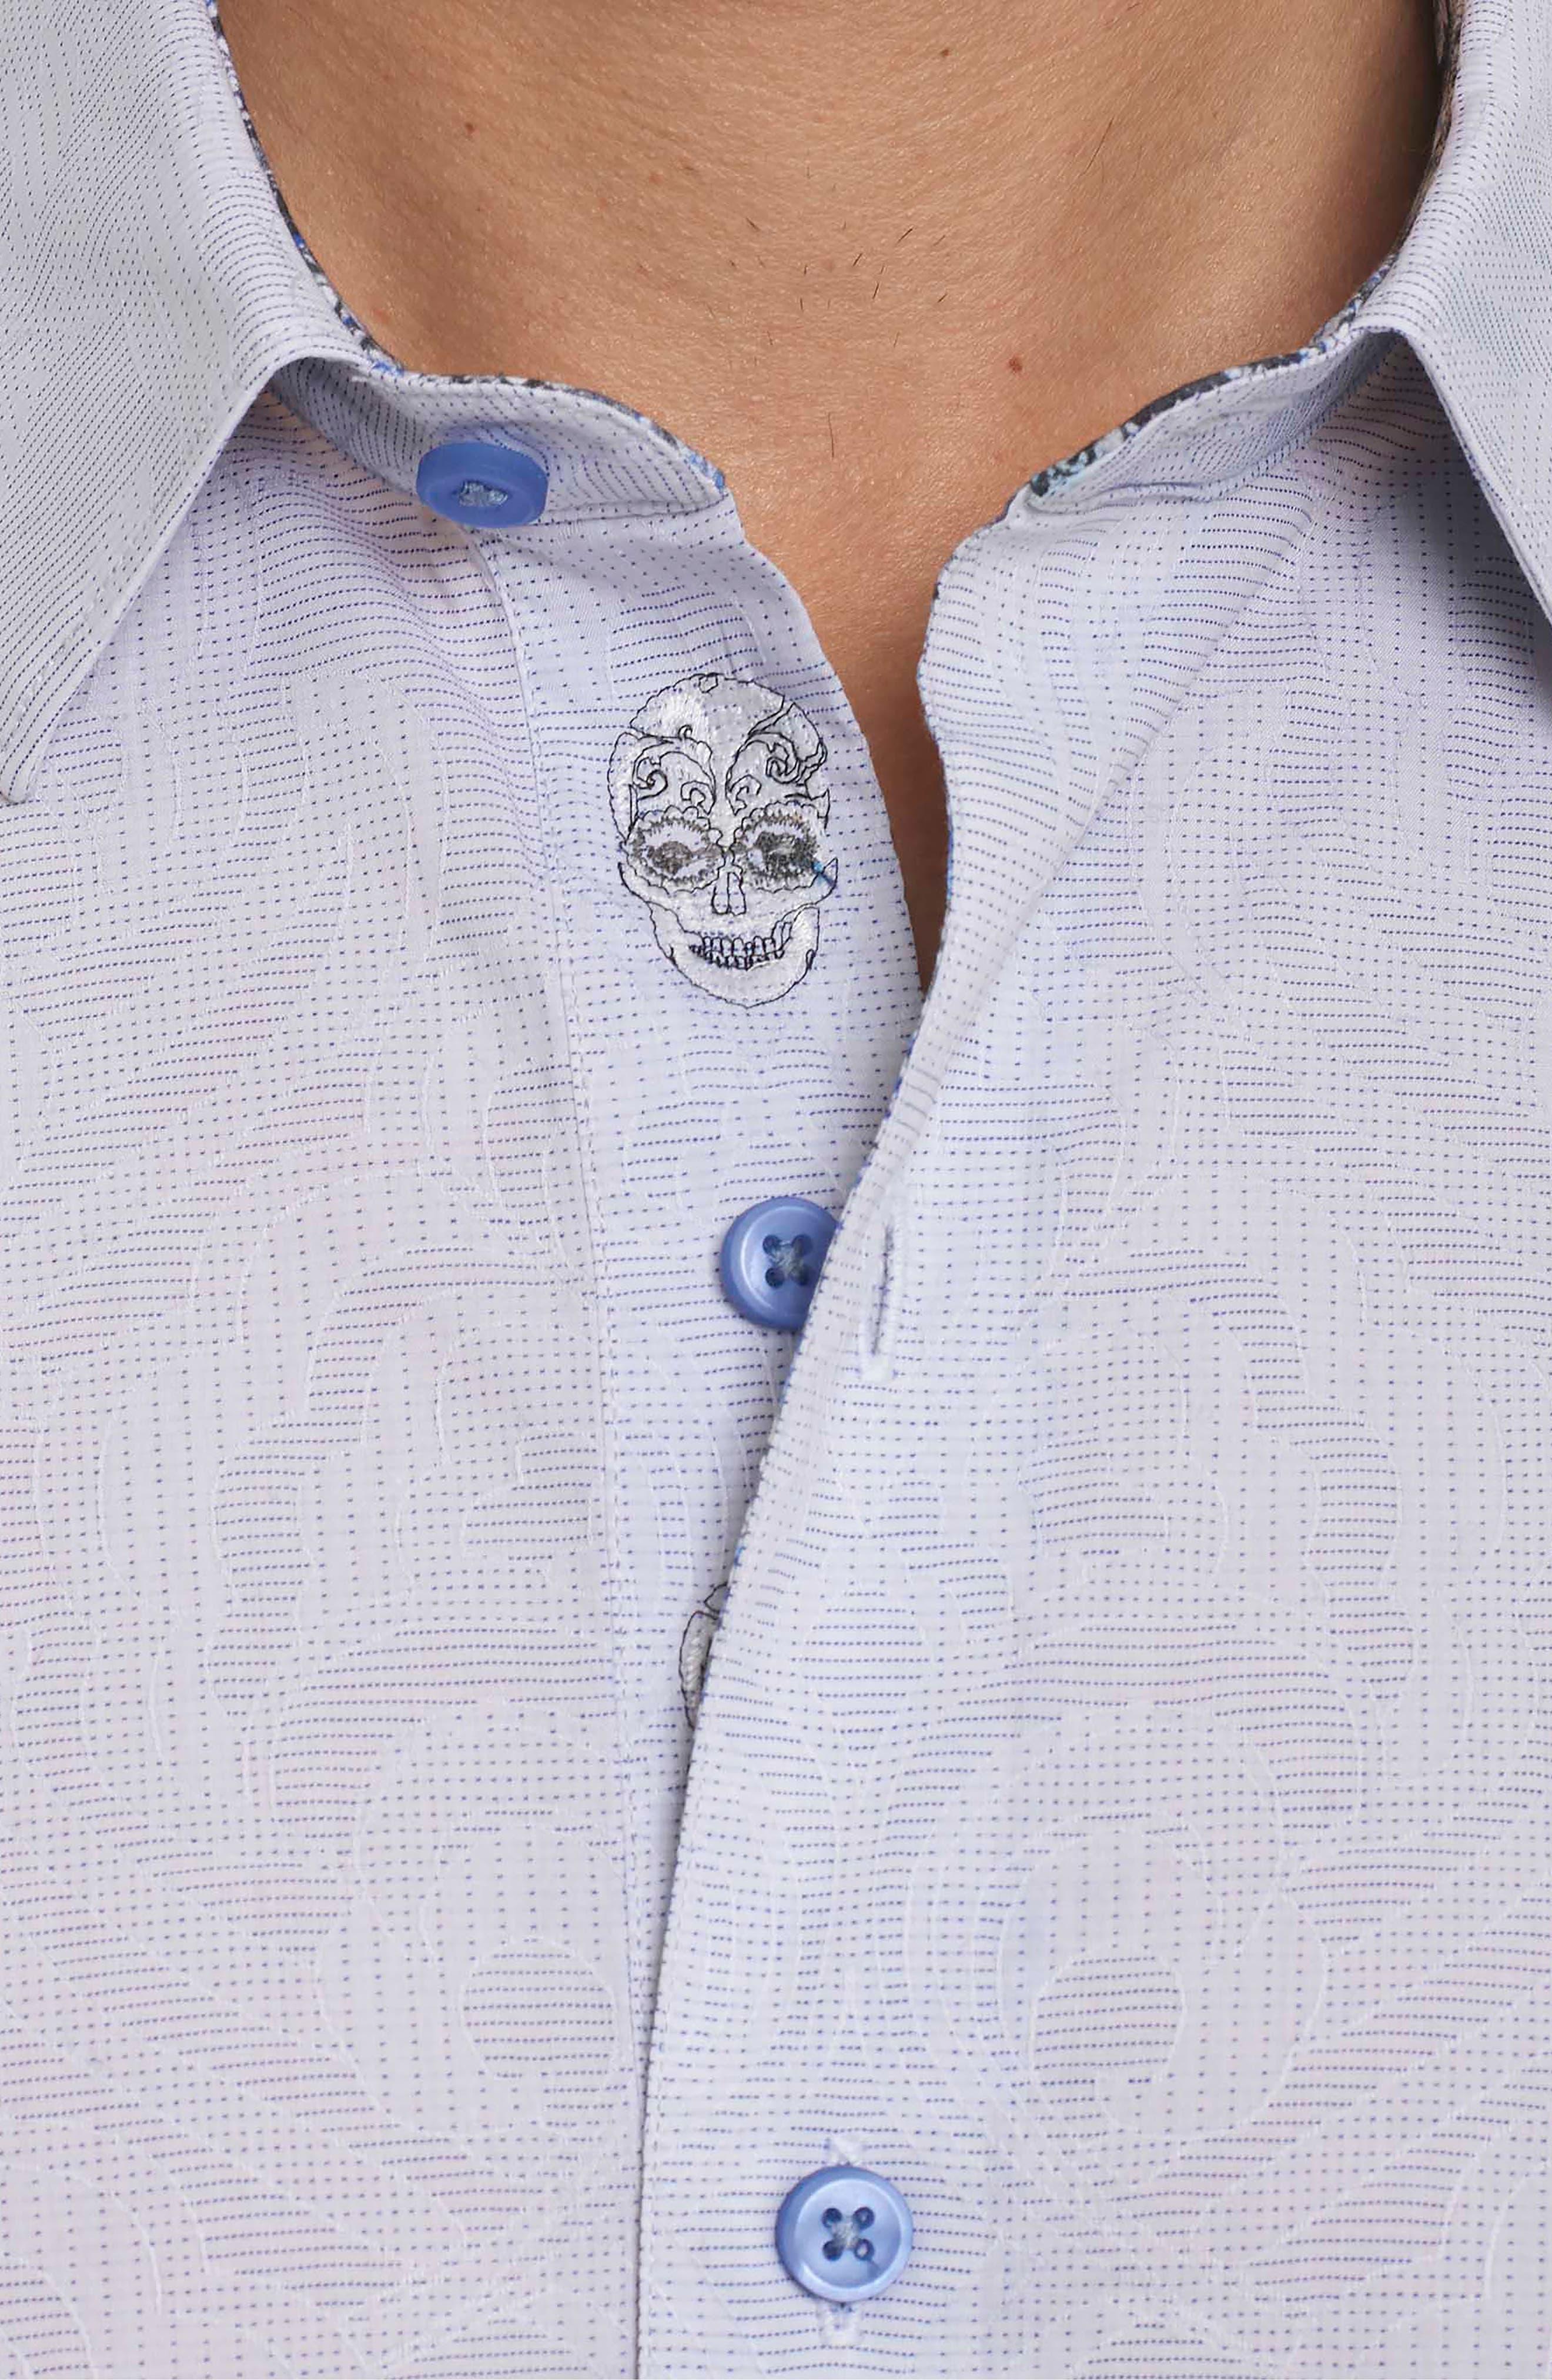 Alex Bay Classic Fit Sport Shirt,                             Alternate thumbnail 4, color,                             White